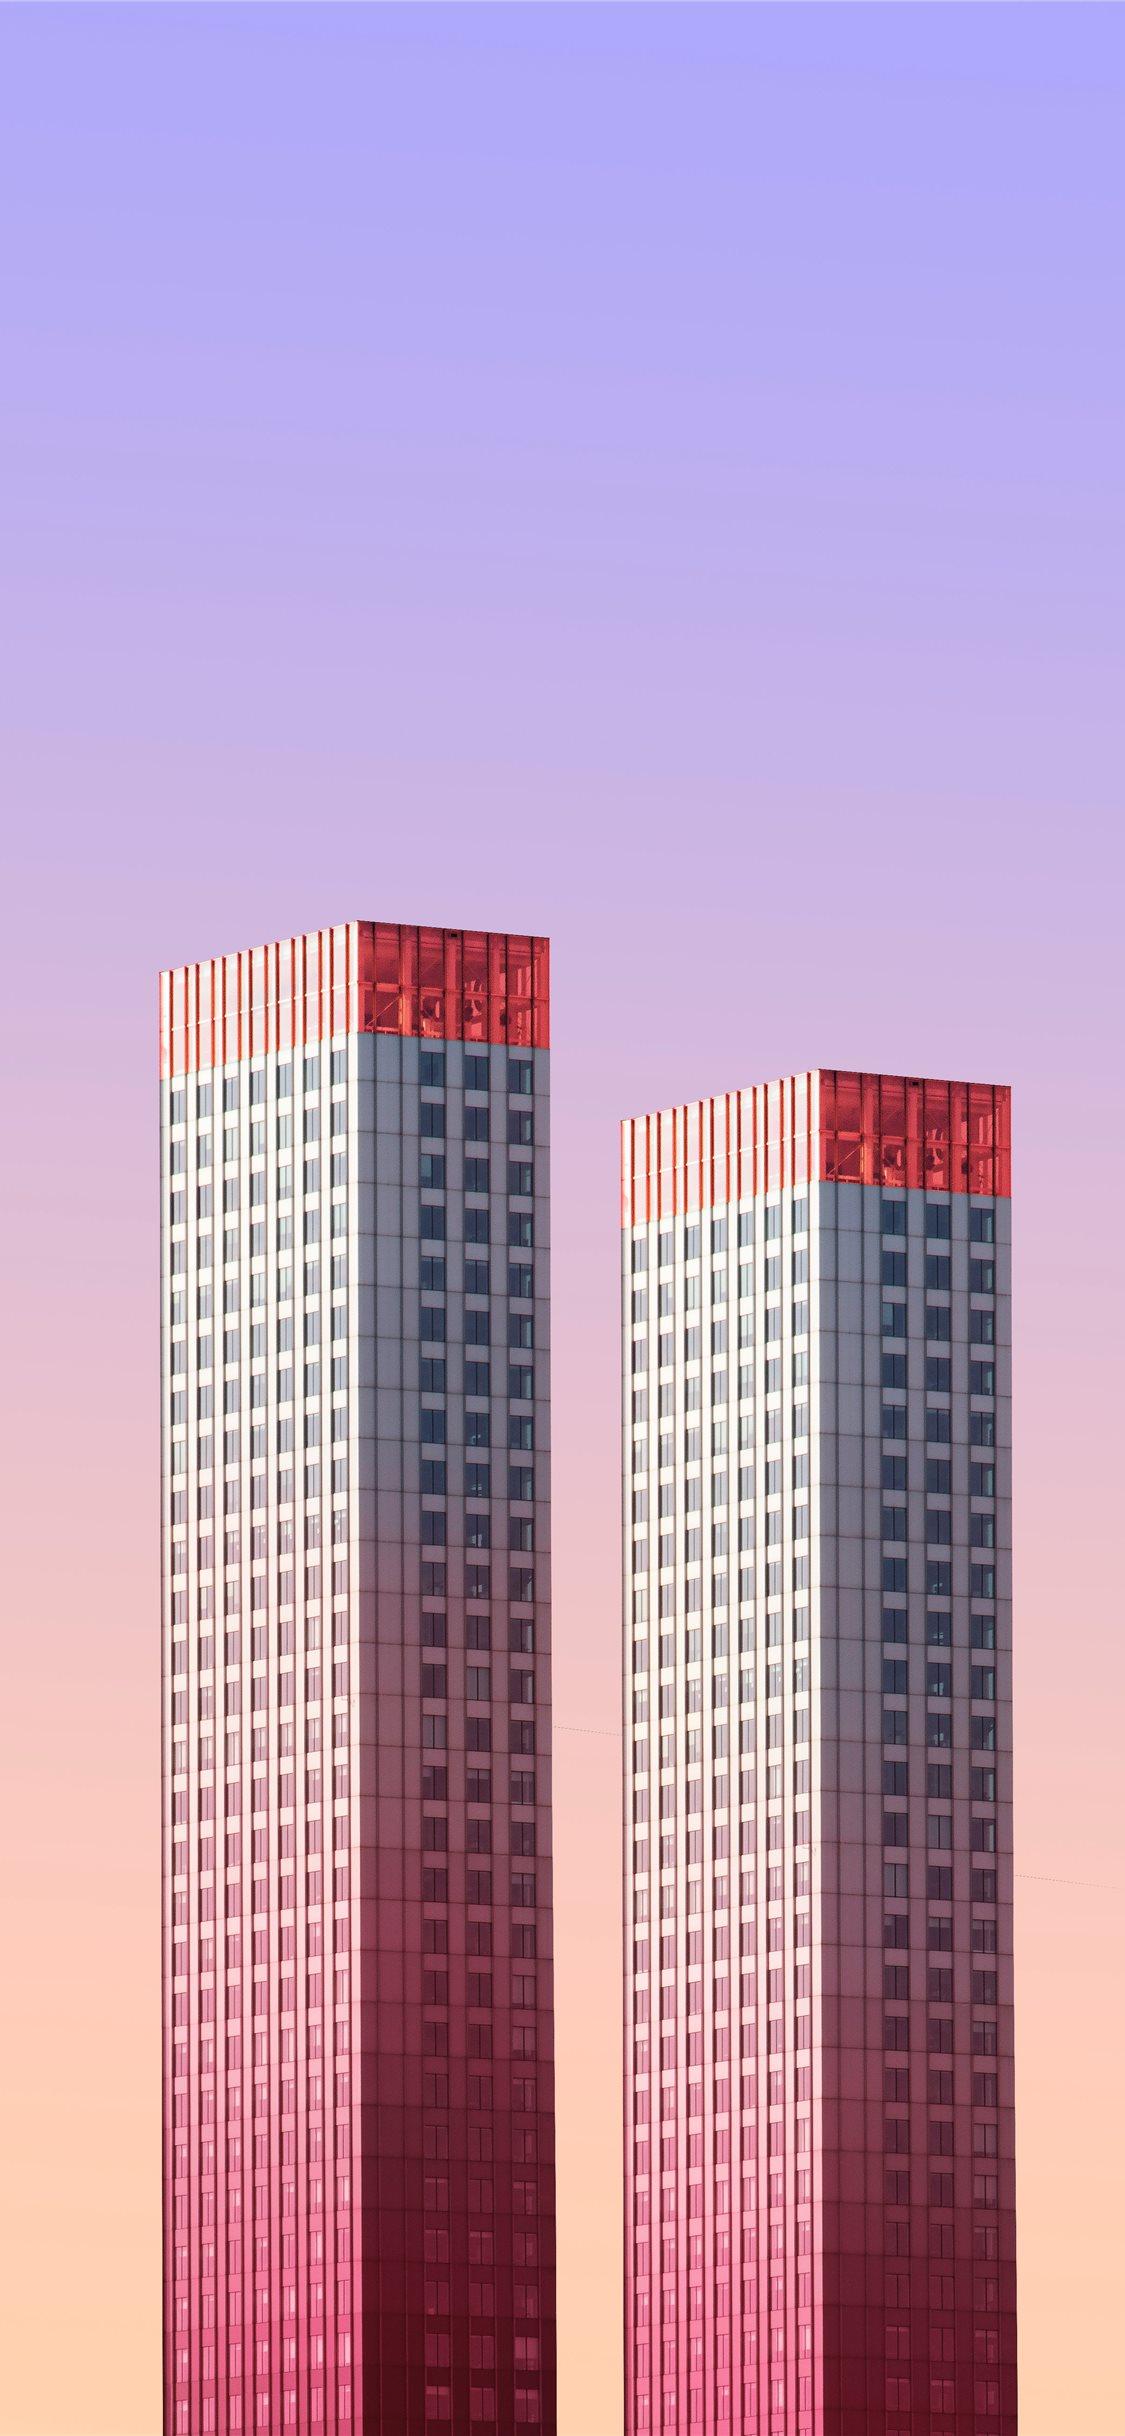 Duplex iPhone X Wallpapers Free Download